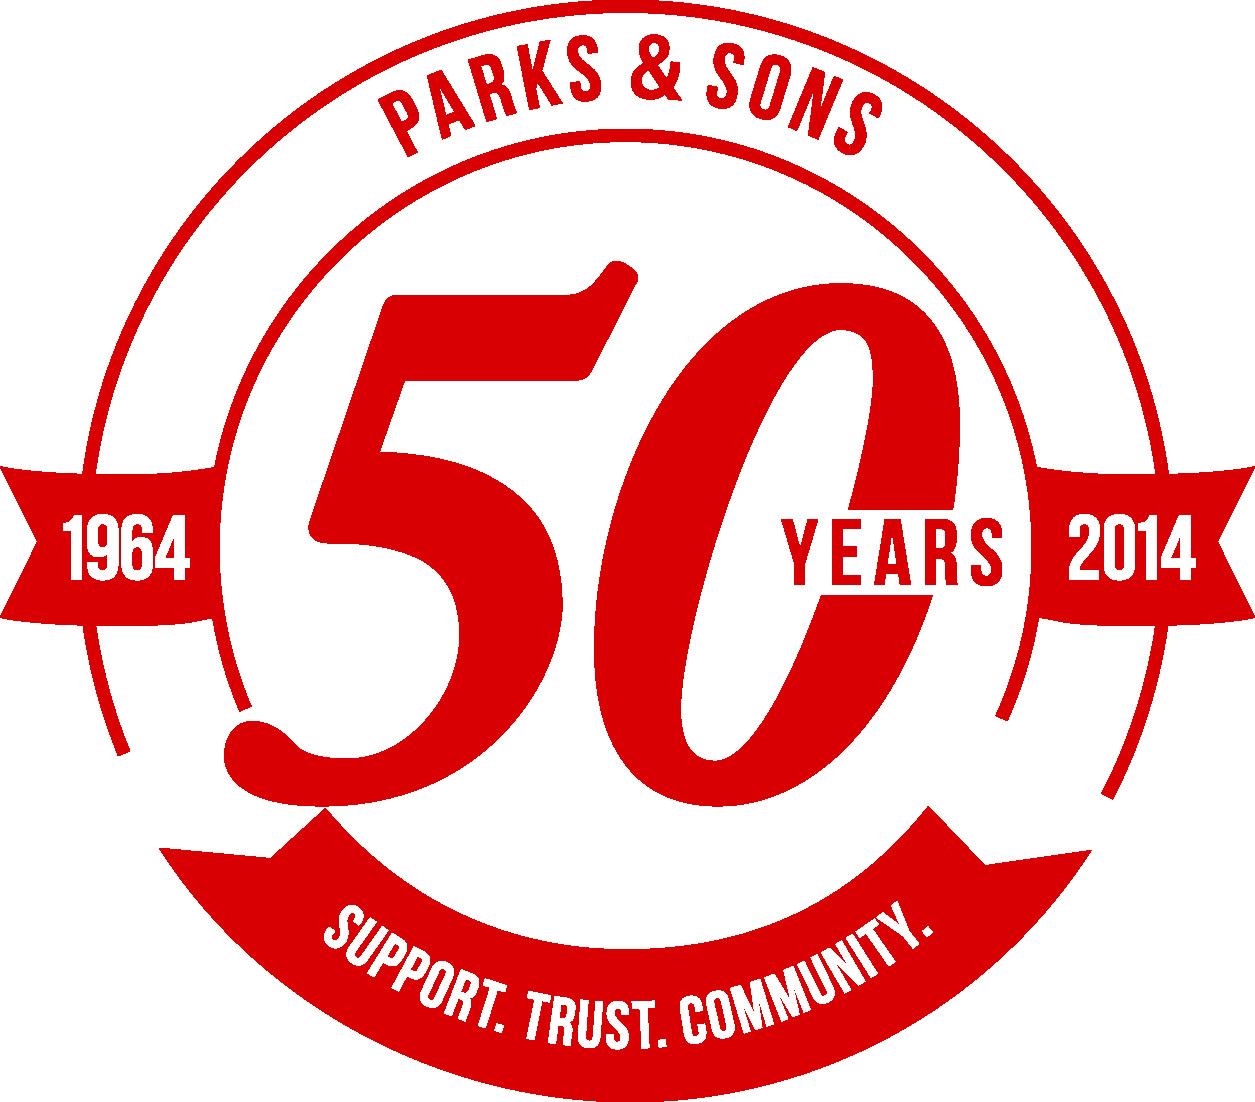 Celebrating Years of Service Celebrating 50 Years of